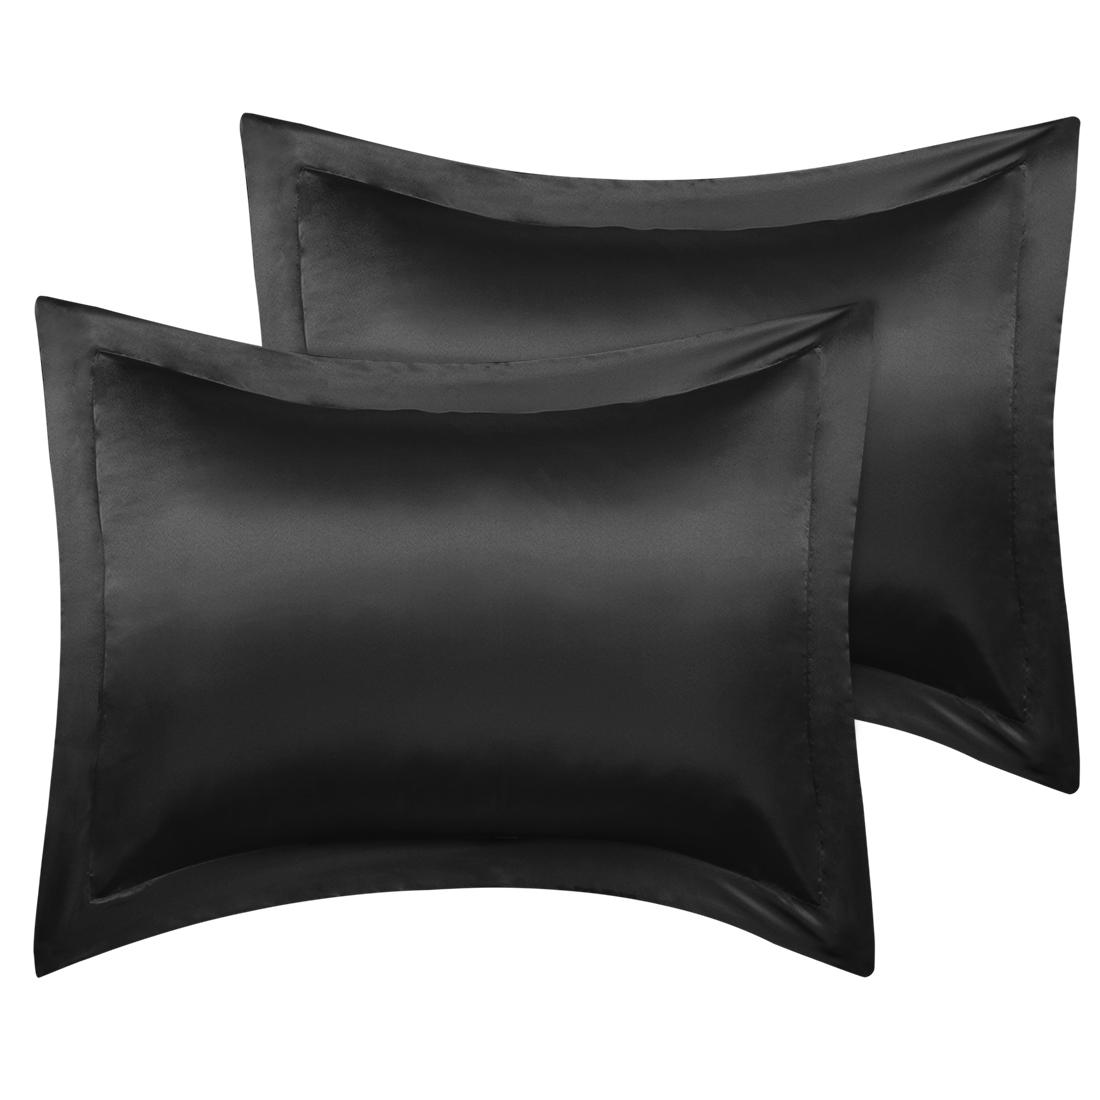 2 Pcs Black Pillow Shams Satin Pillow Cases Queen Oxford Pillowcases